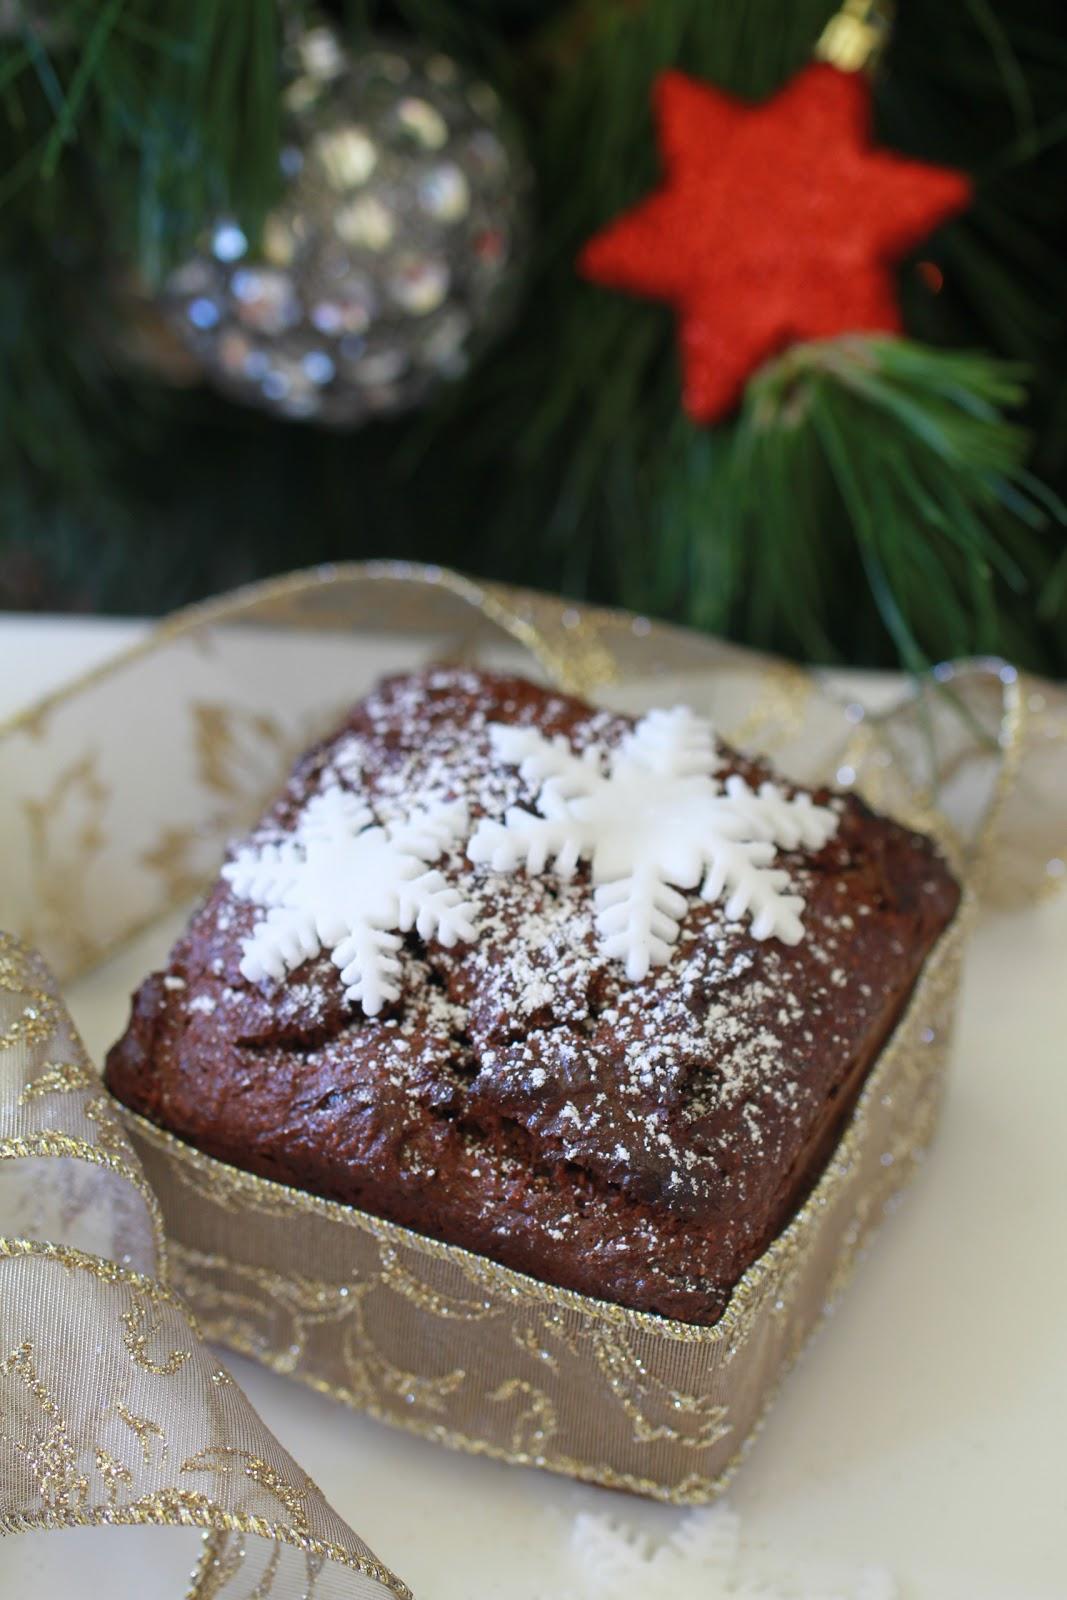 Chocolate Kahlua Cake With Orange Zest